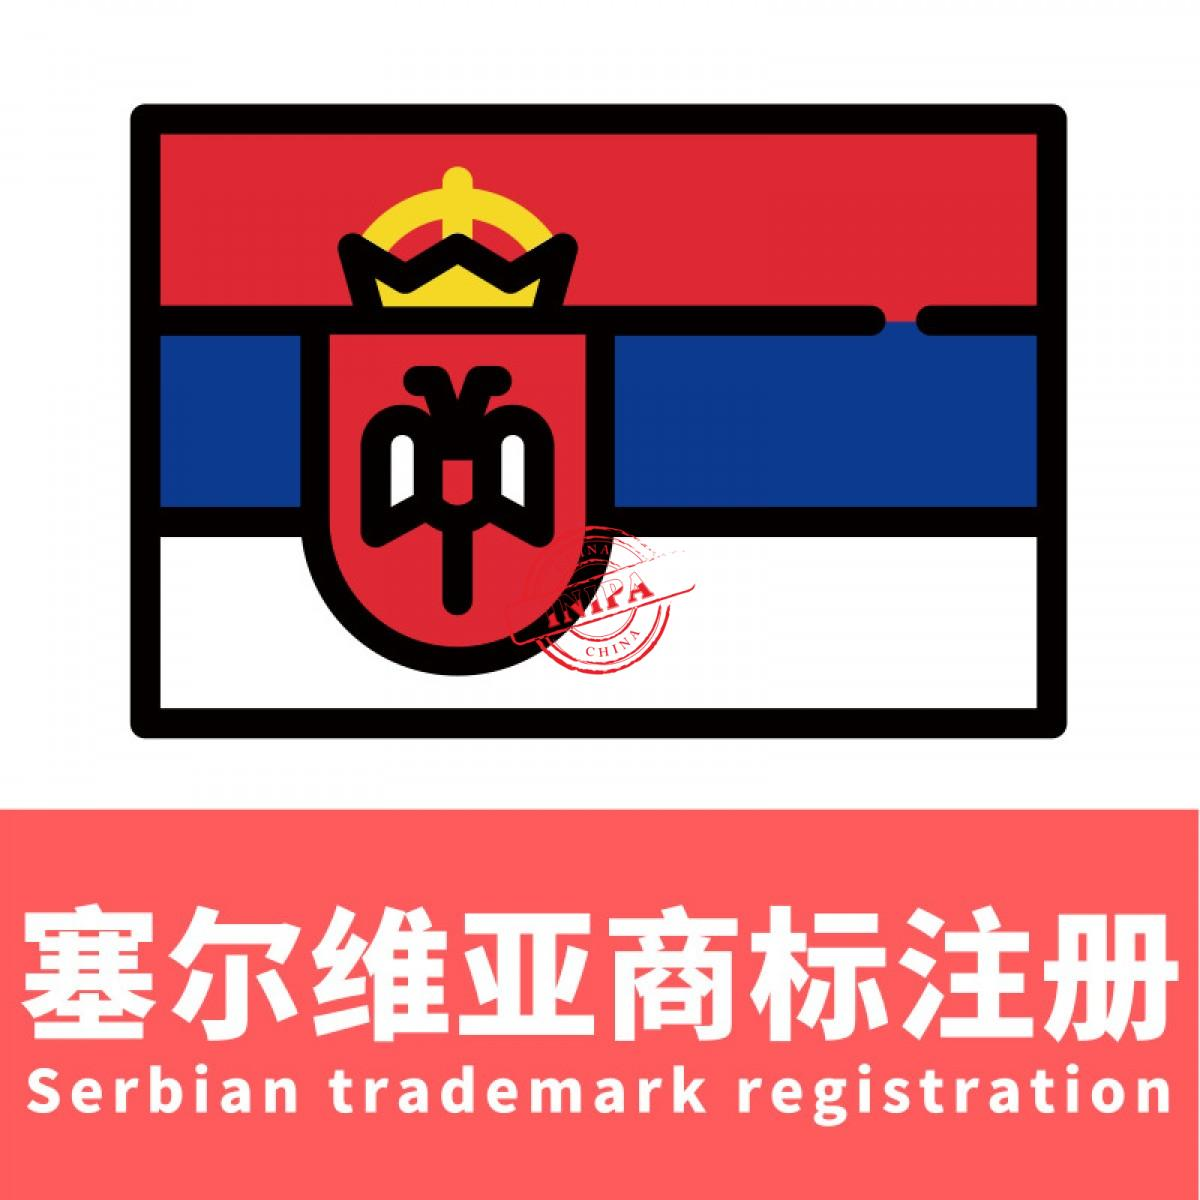 塞尔维亚商标注册/Serbian trademark registration